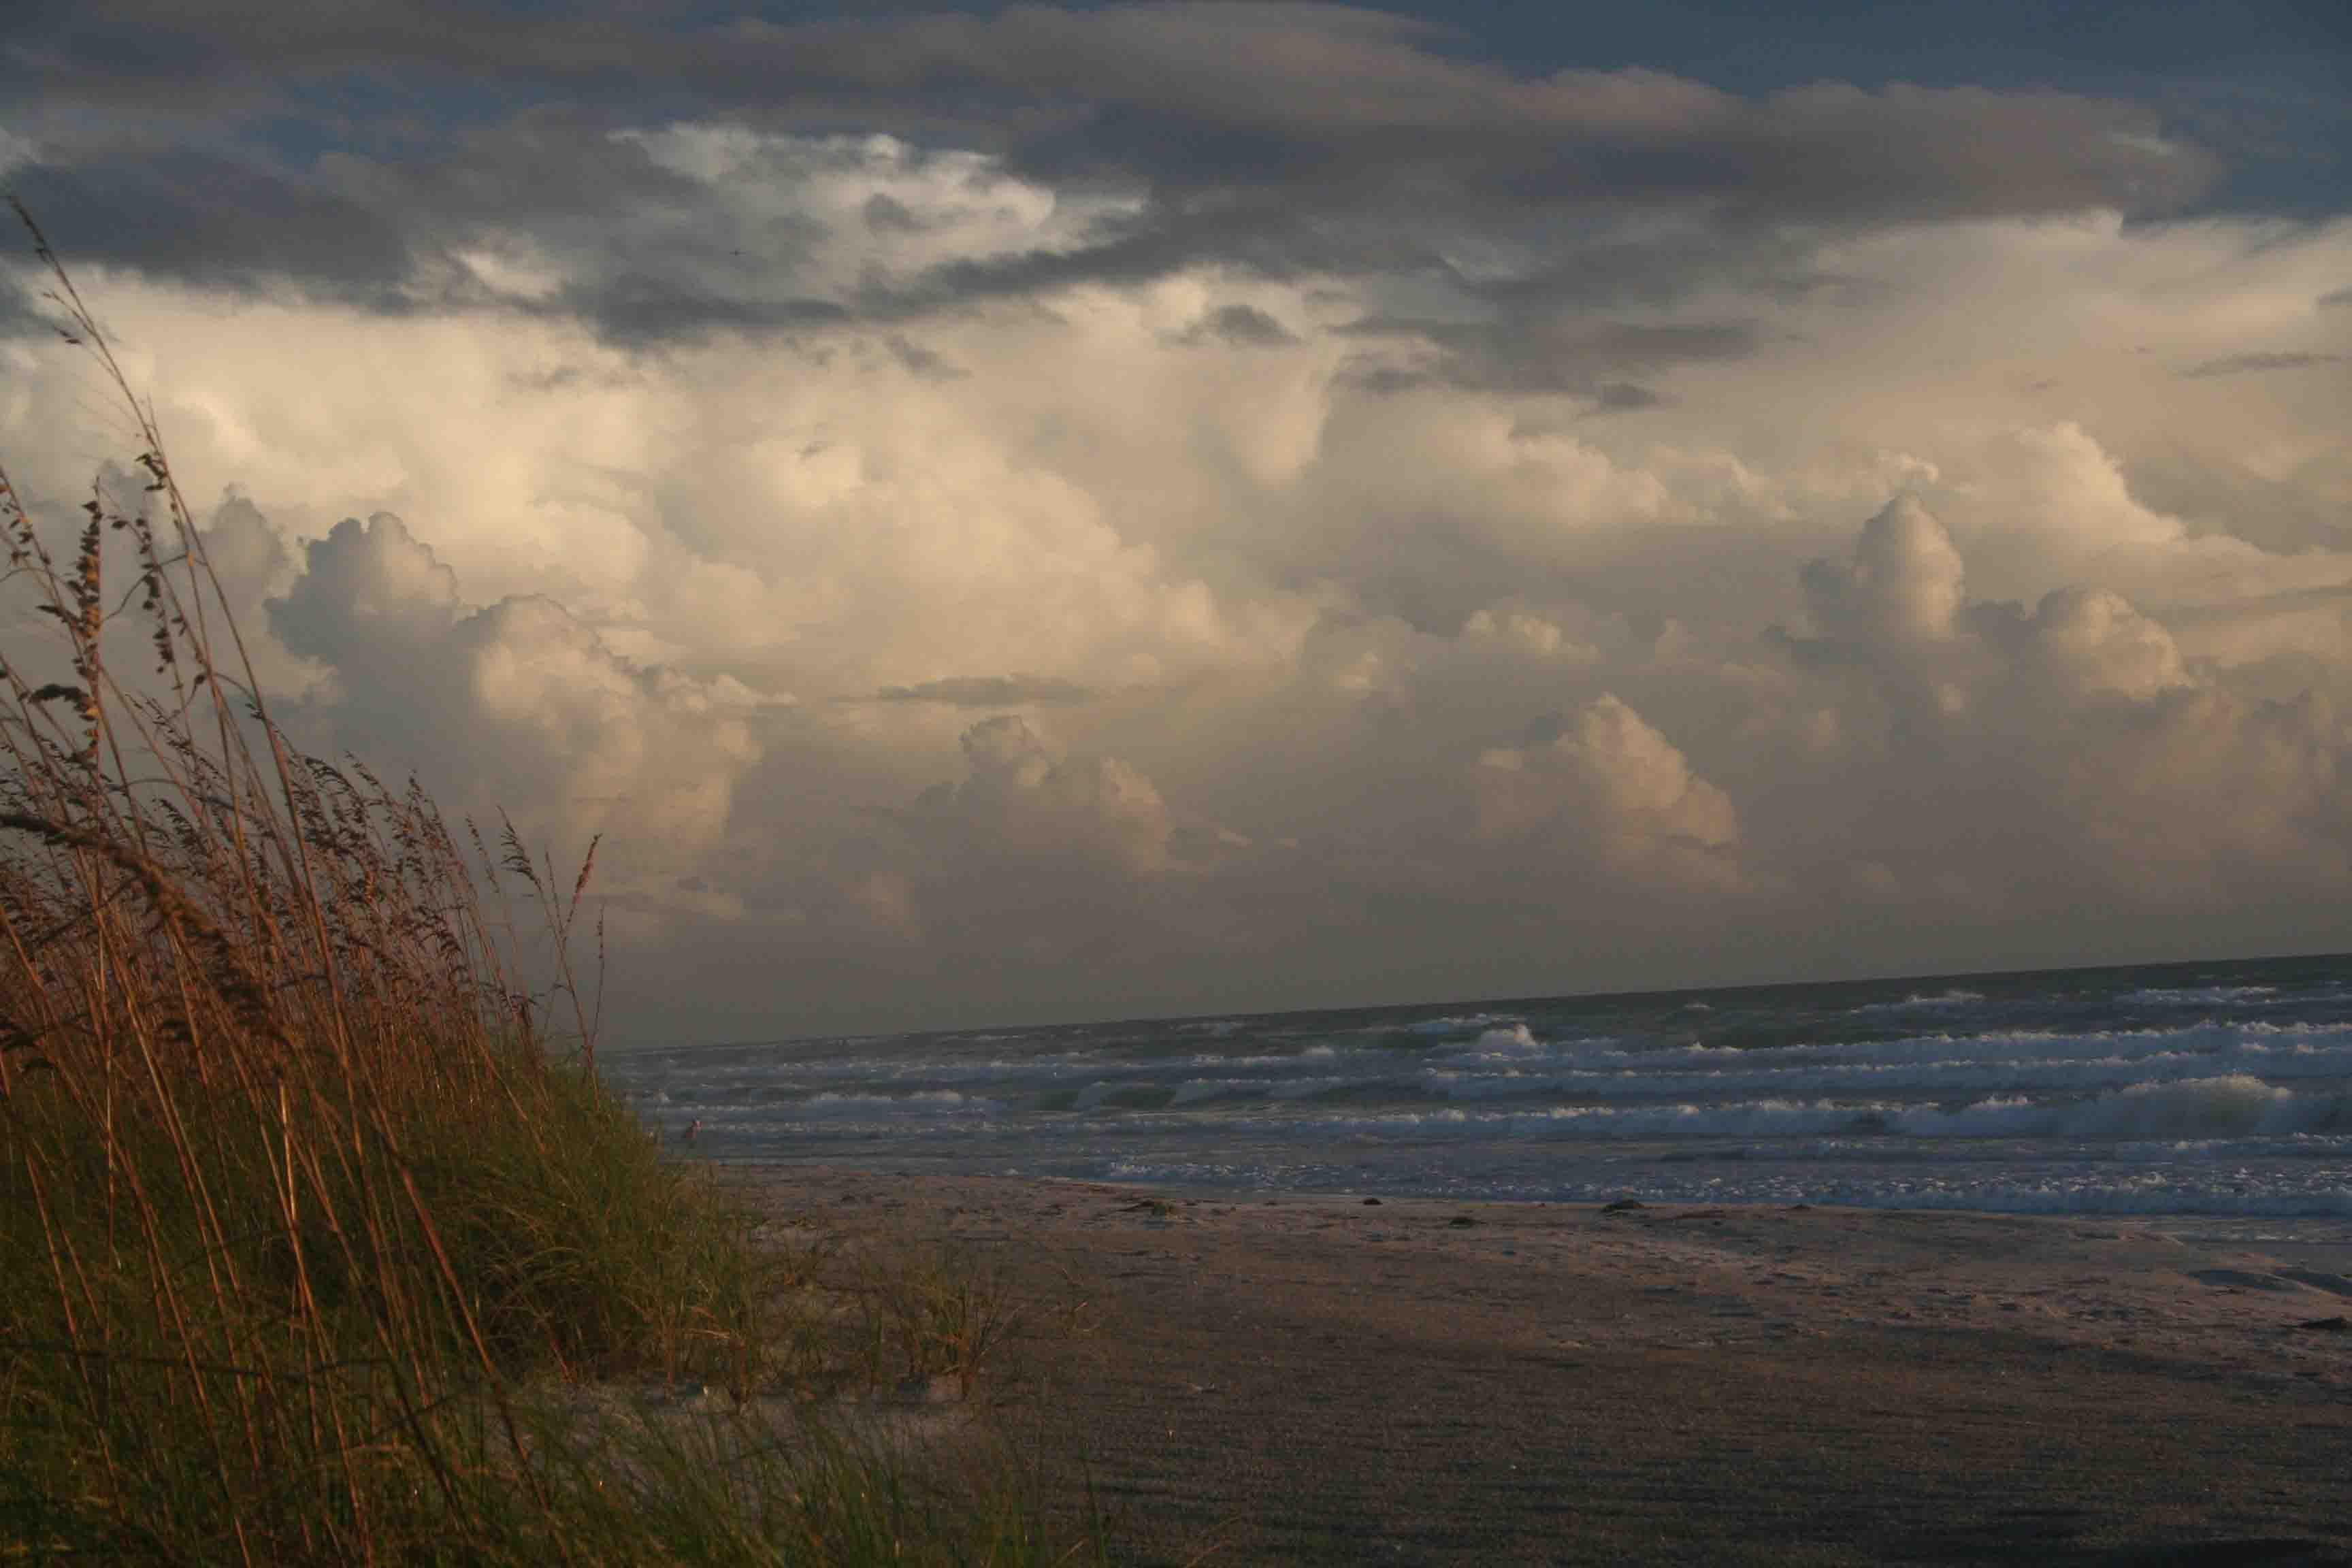 Beach And Ocean Storm: Inner Peace Illuminations